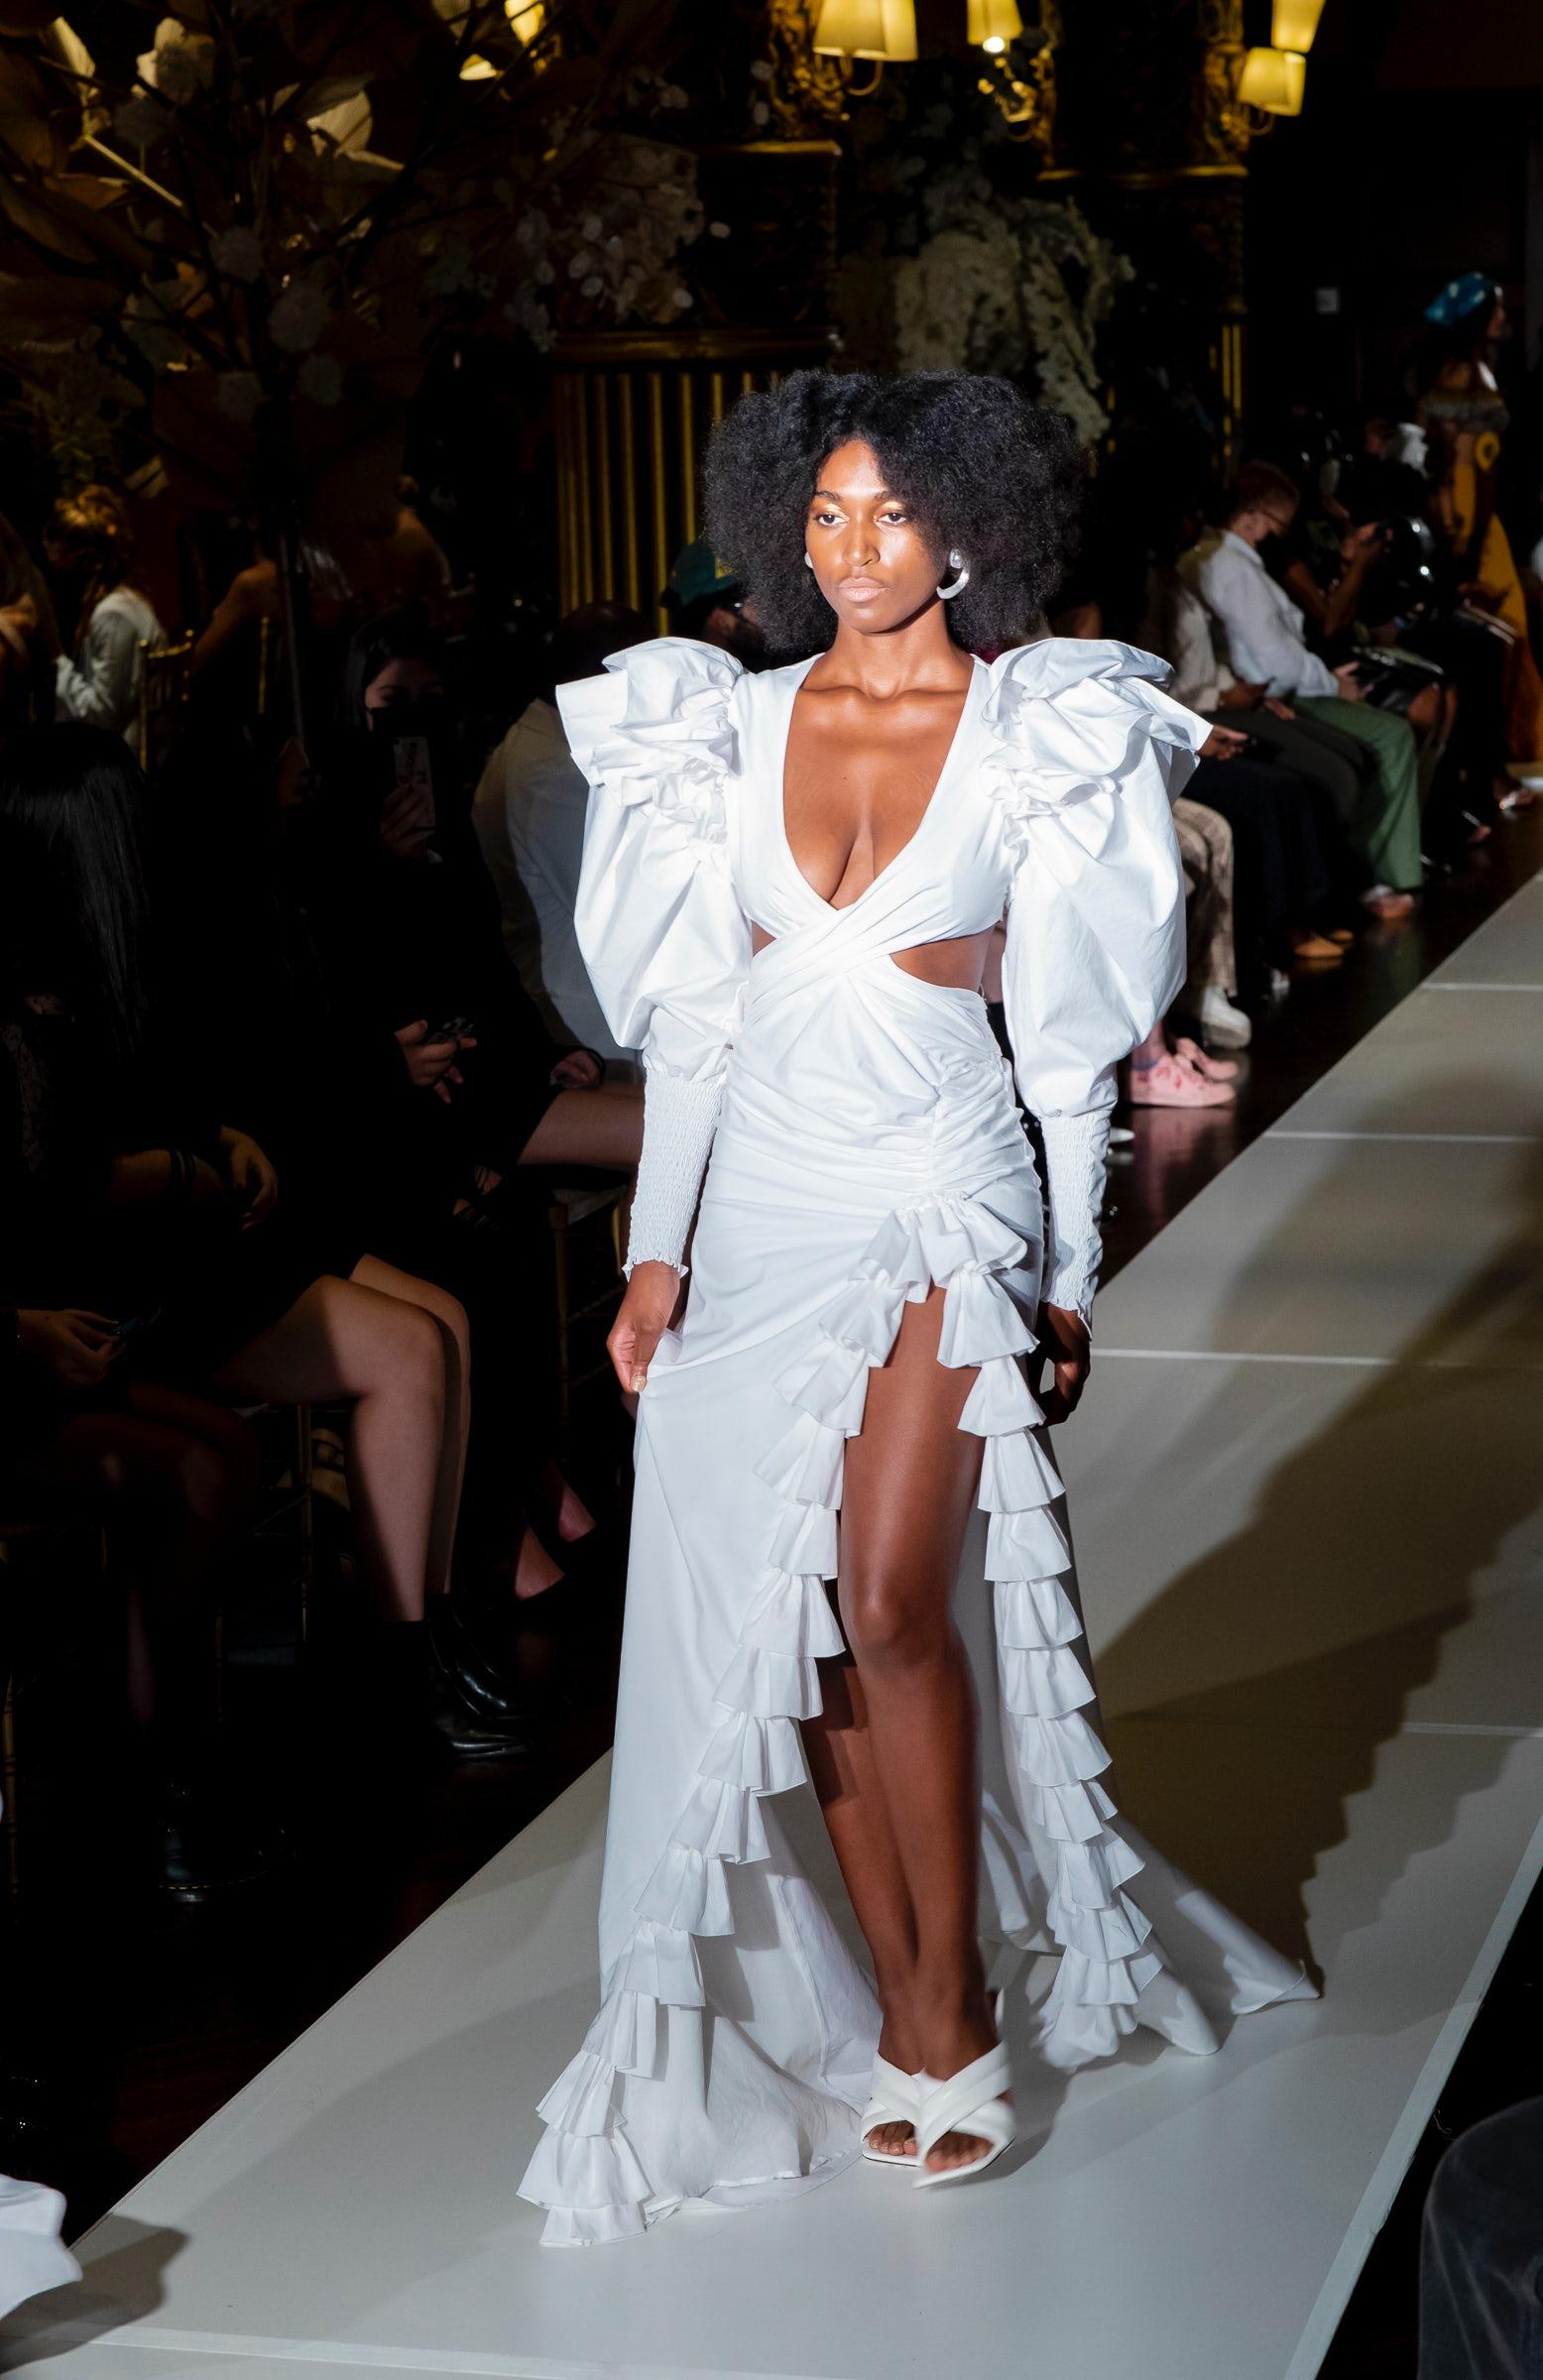 A model embodying the designers\' vision walks runway Bohn Jsell\'s Spring/Summer 2022. DiAngela Payne.